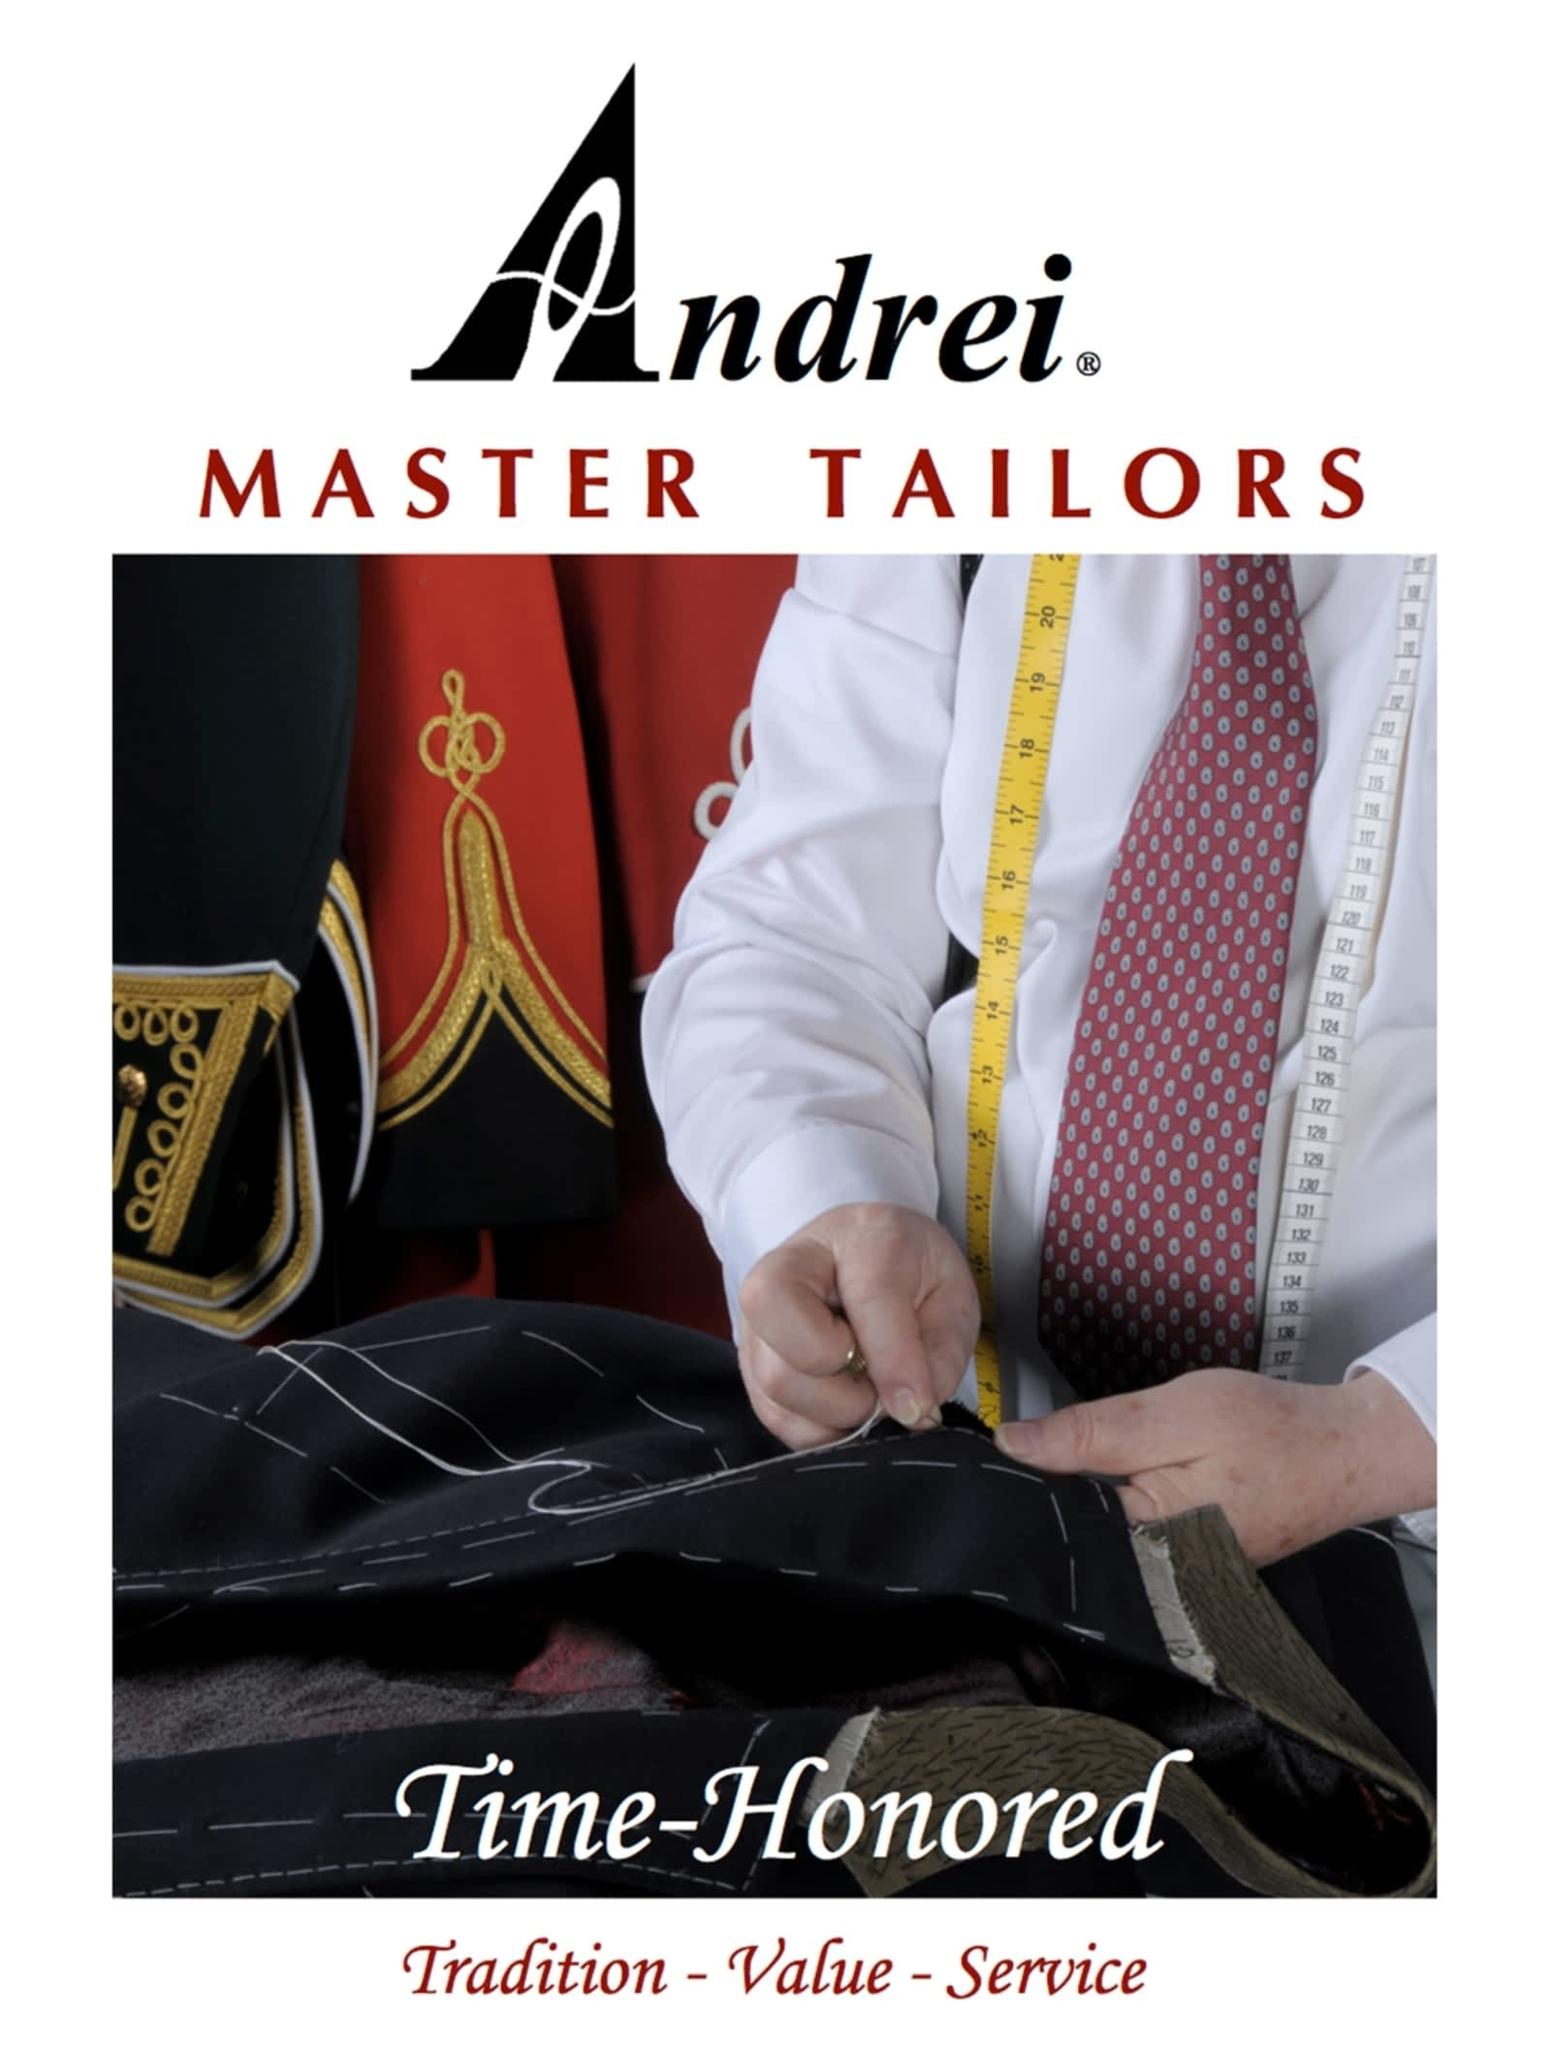 Andrei Master Tailors in Kingston